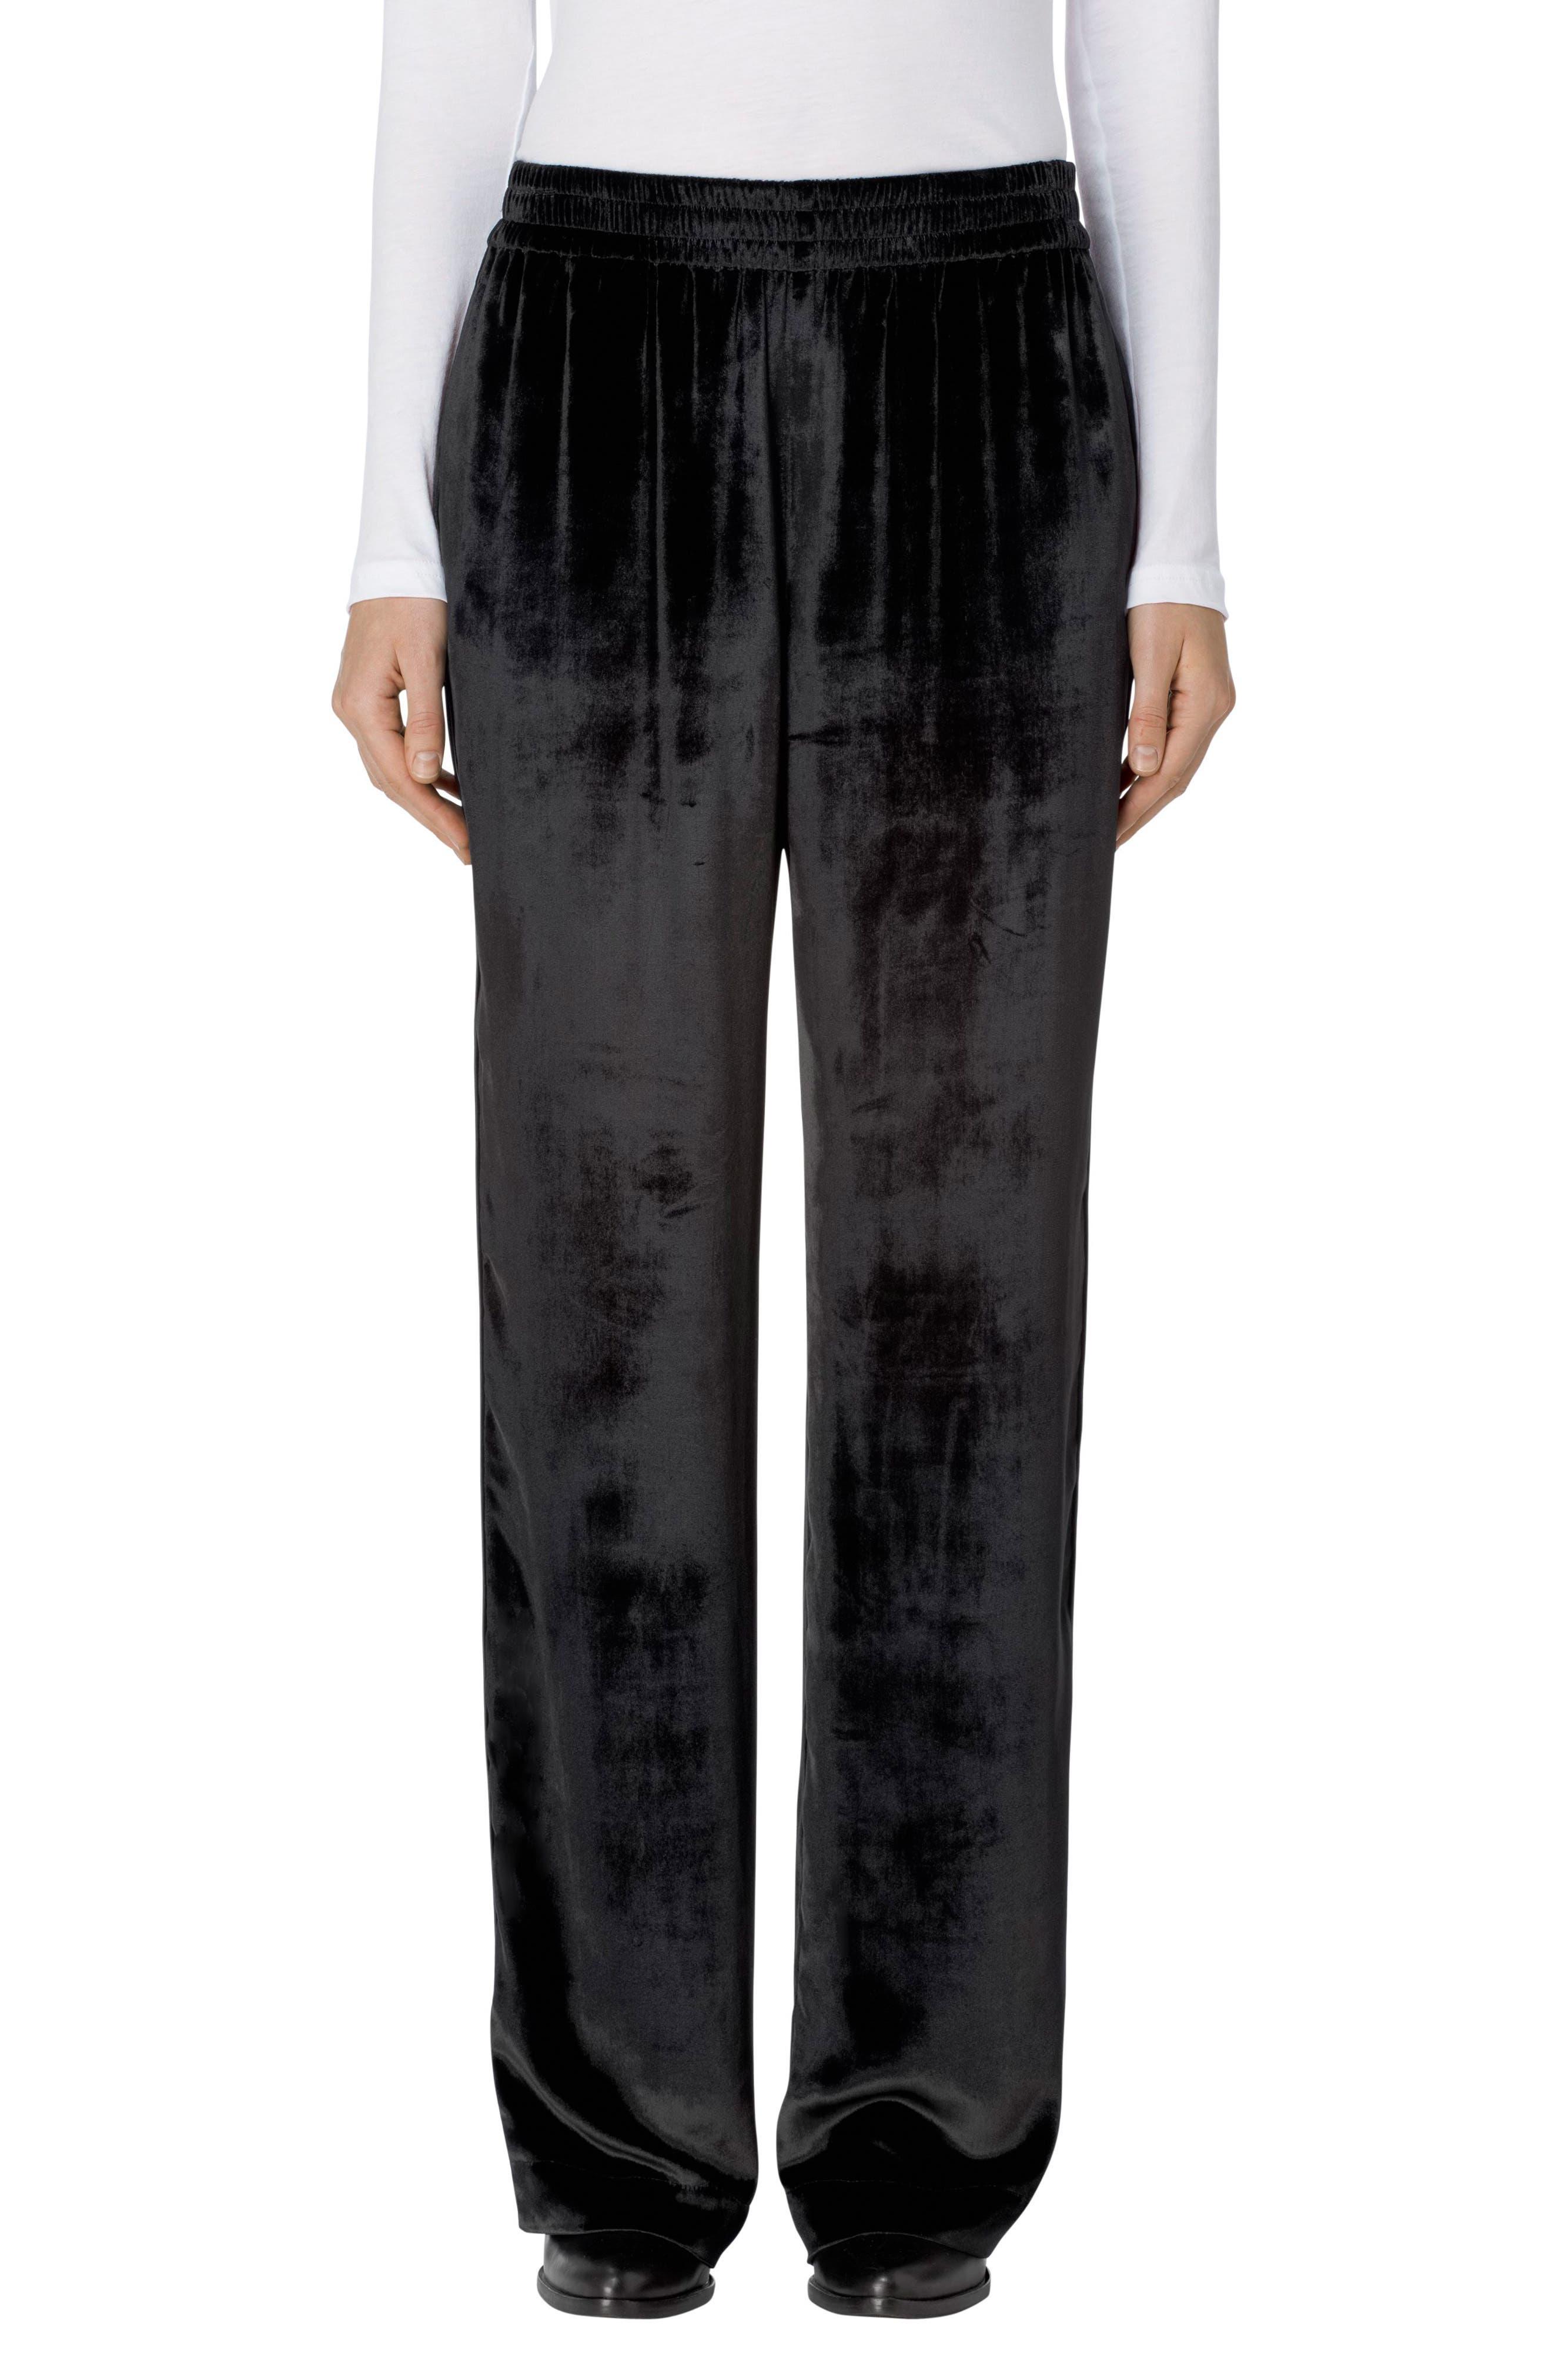 Ardon Velvet Pants,                         Main,                         color, Black